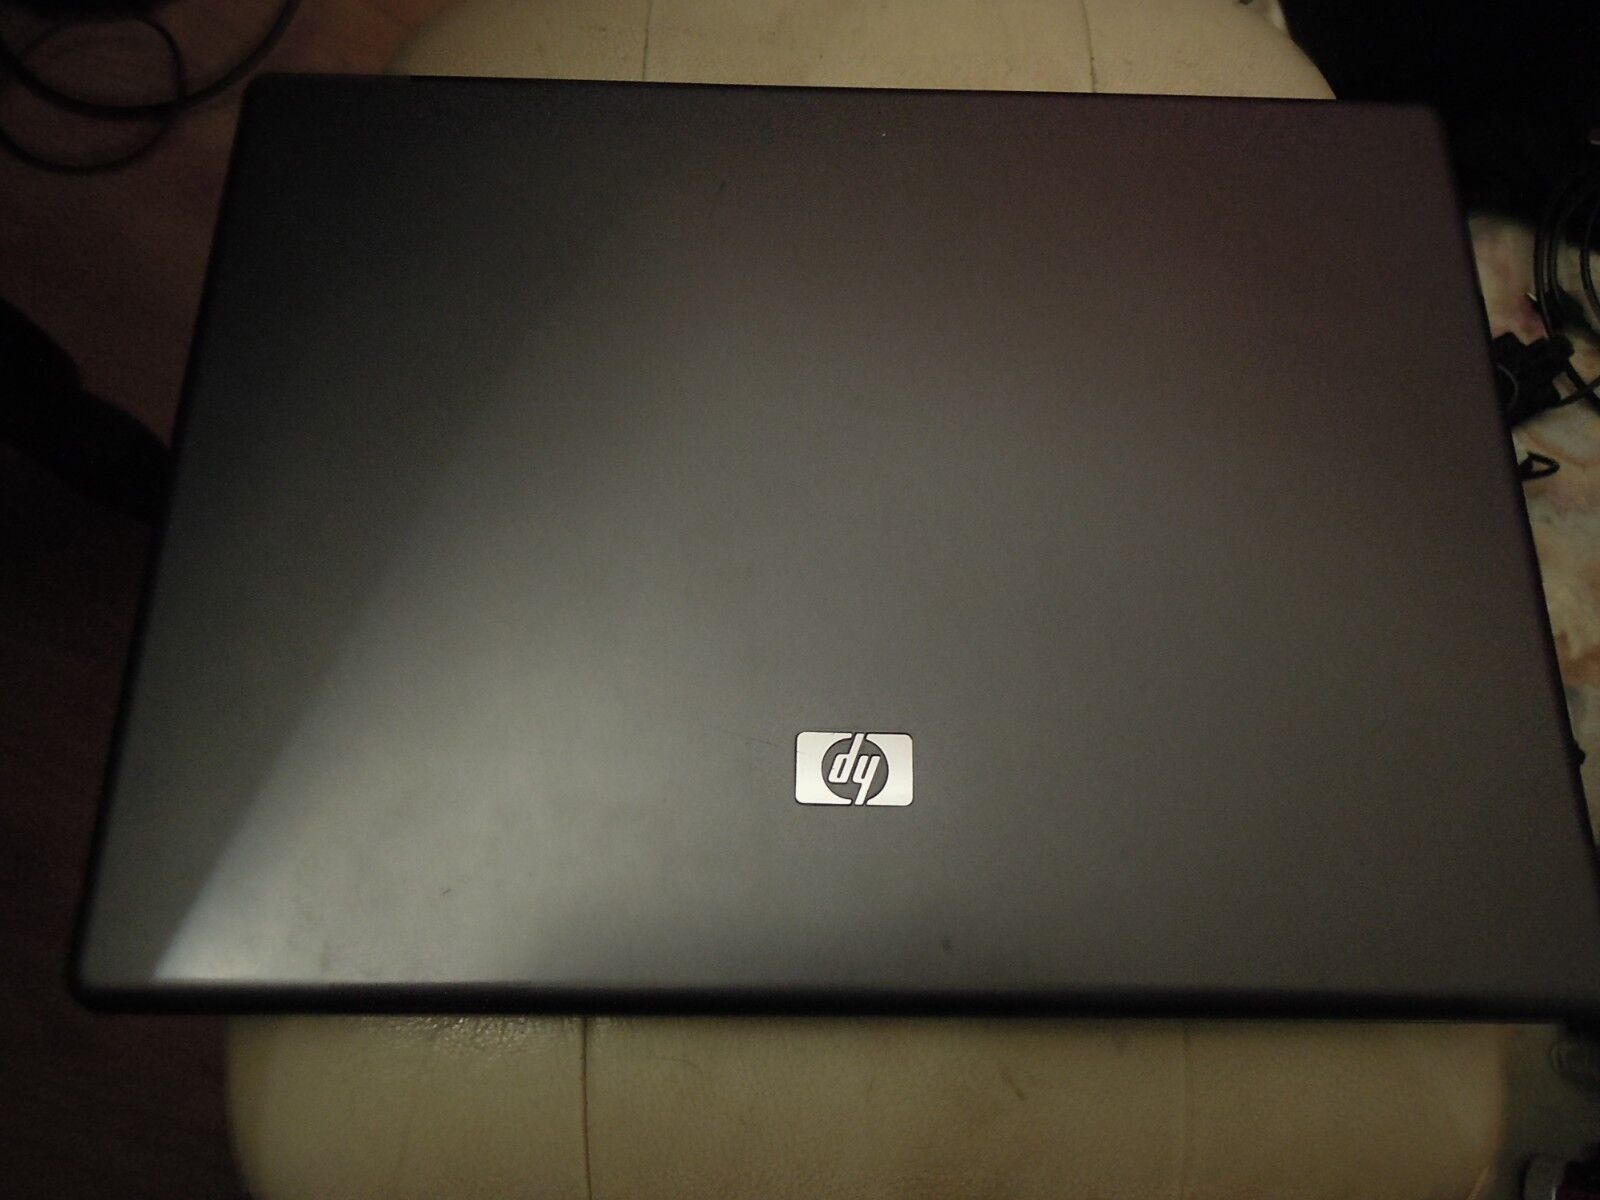 "Laptop Windows - hp 550 Laptop14.1""intel m550 1GB RAM 120 GB HARD DRIVE WINDOWS 10 OFFICE XP"